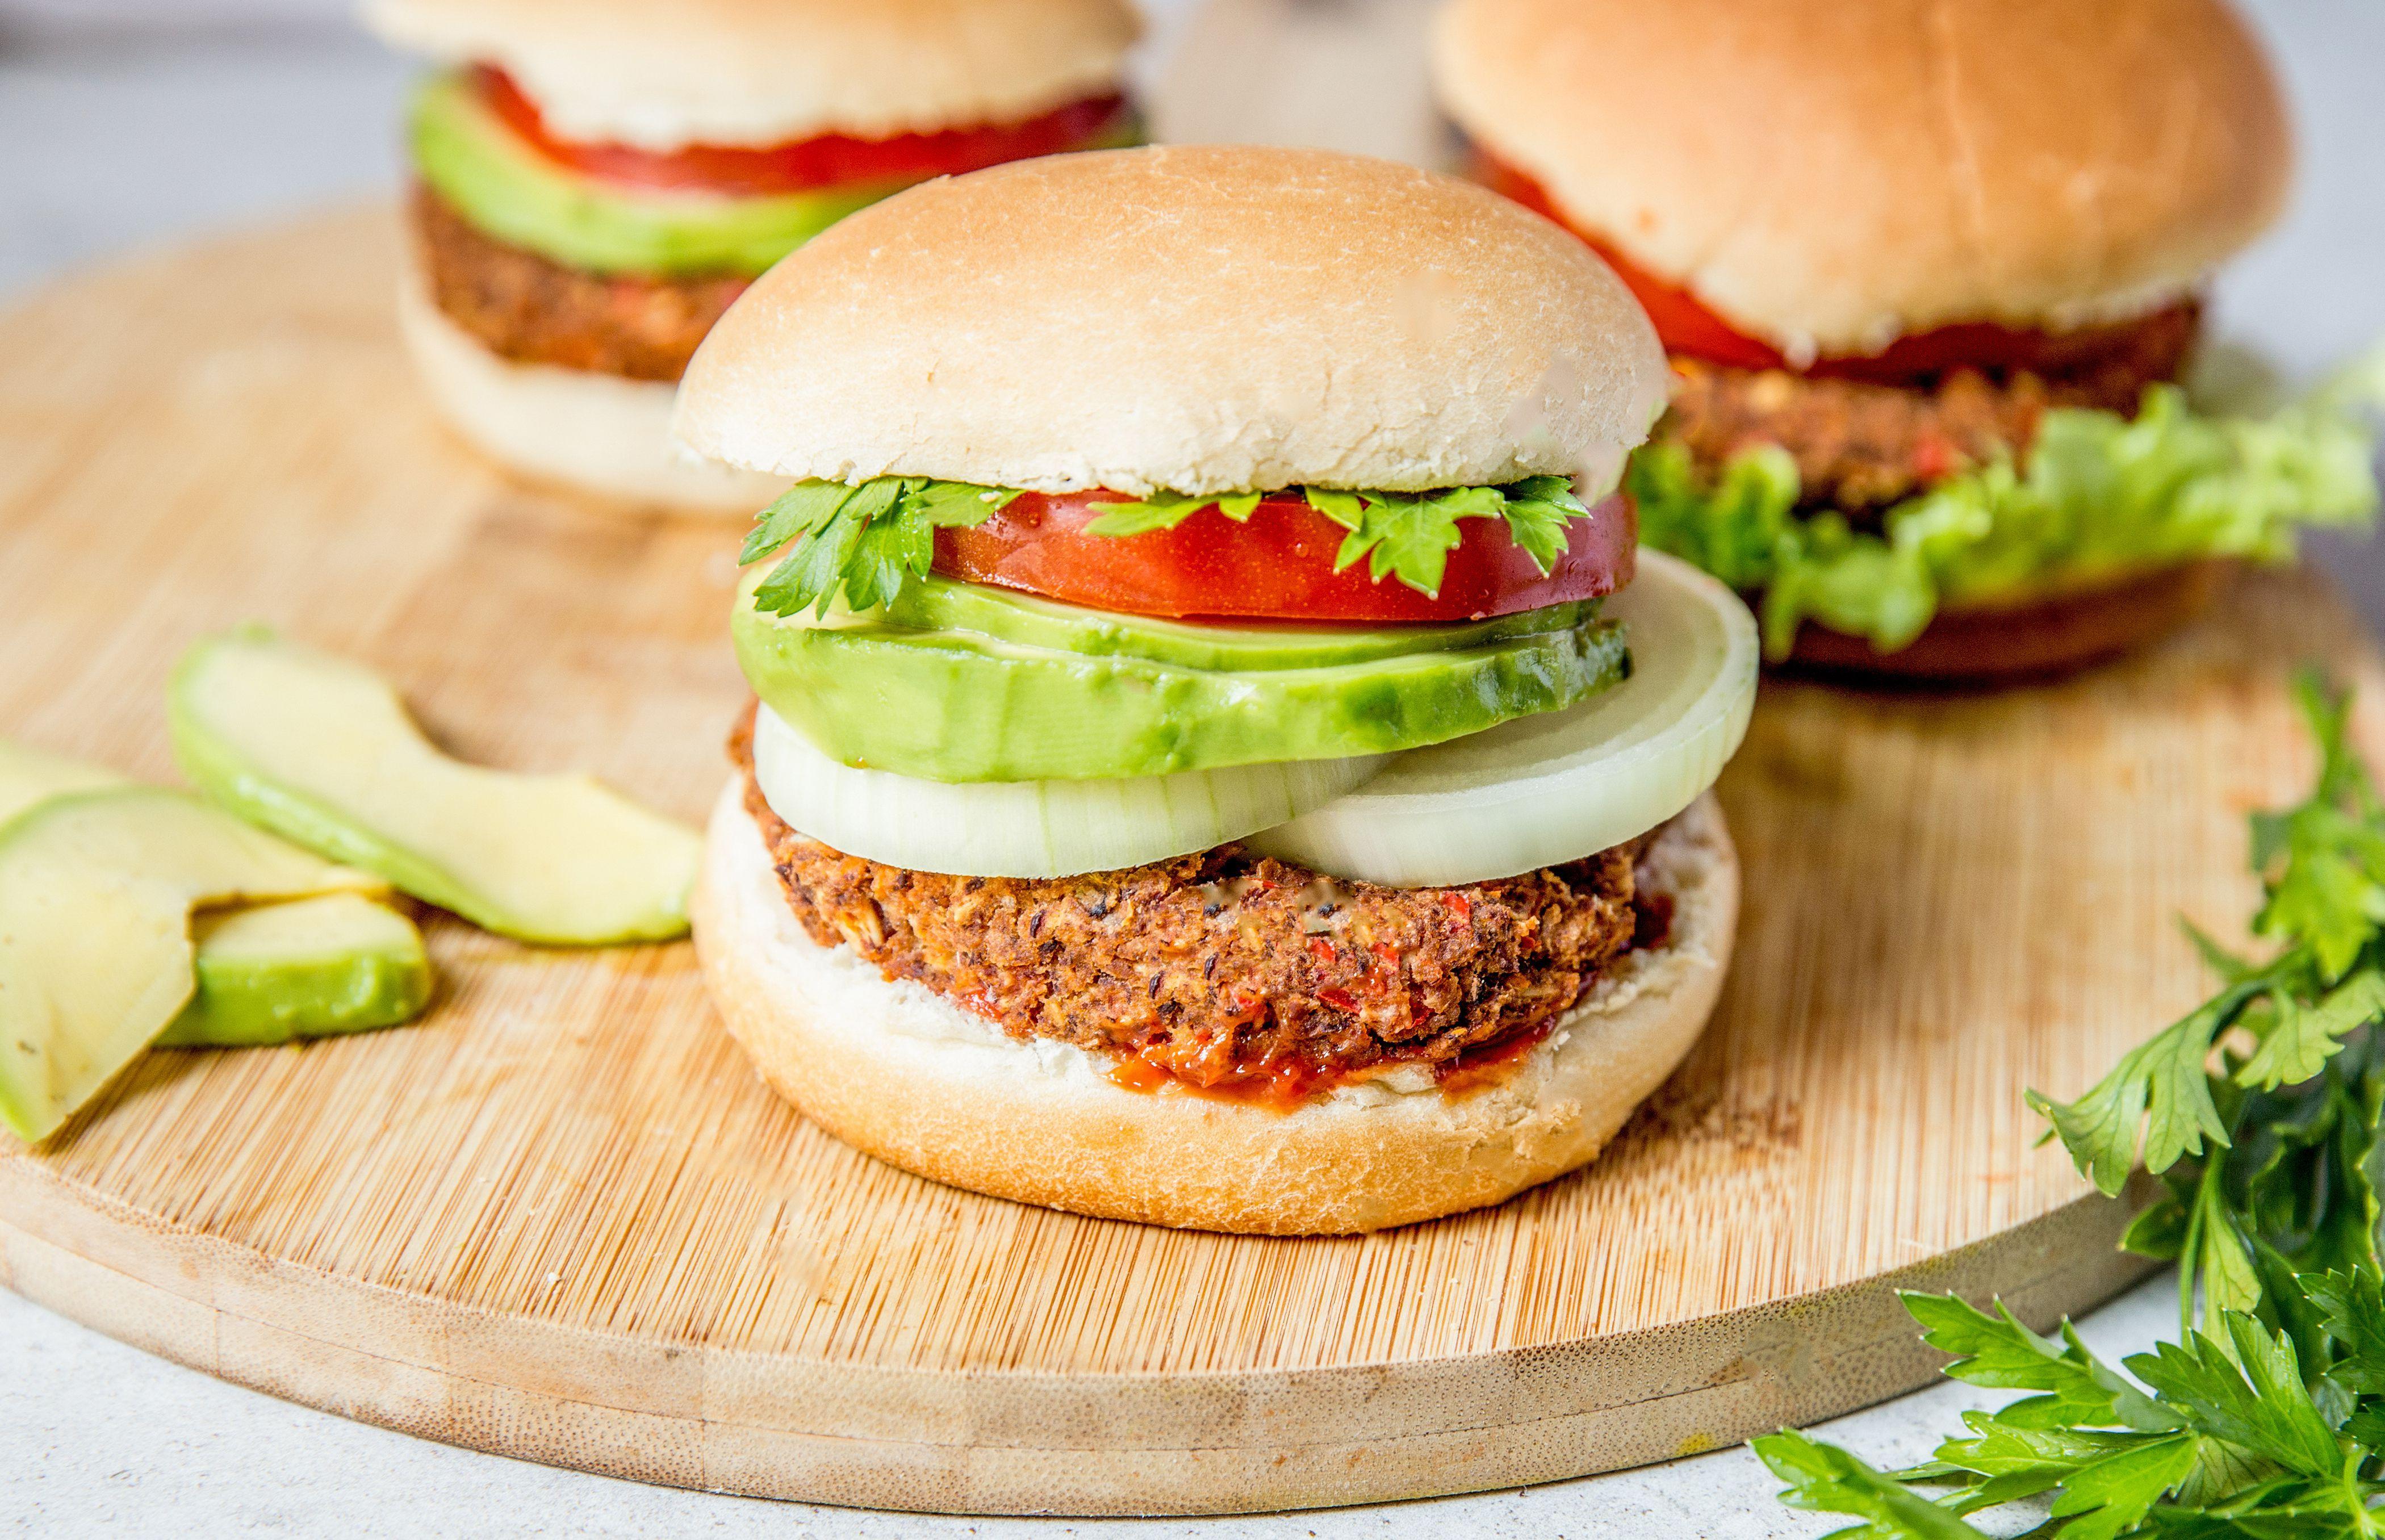 Kidney Bean And Mushroom Veggie Burger Recipe Recipe Veggie Burgers Recipe Veggie Burger Mushroom Veggie Burger